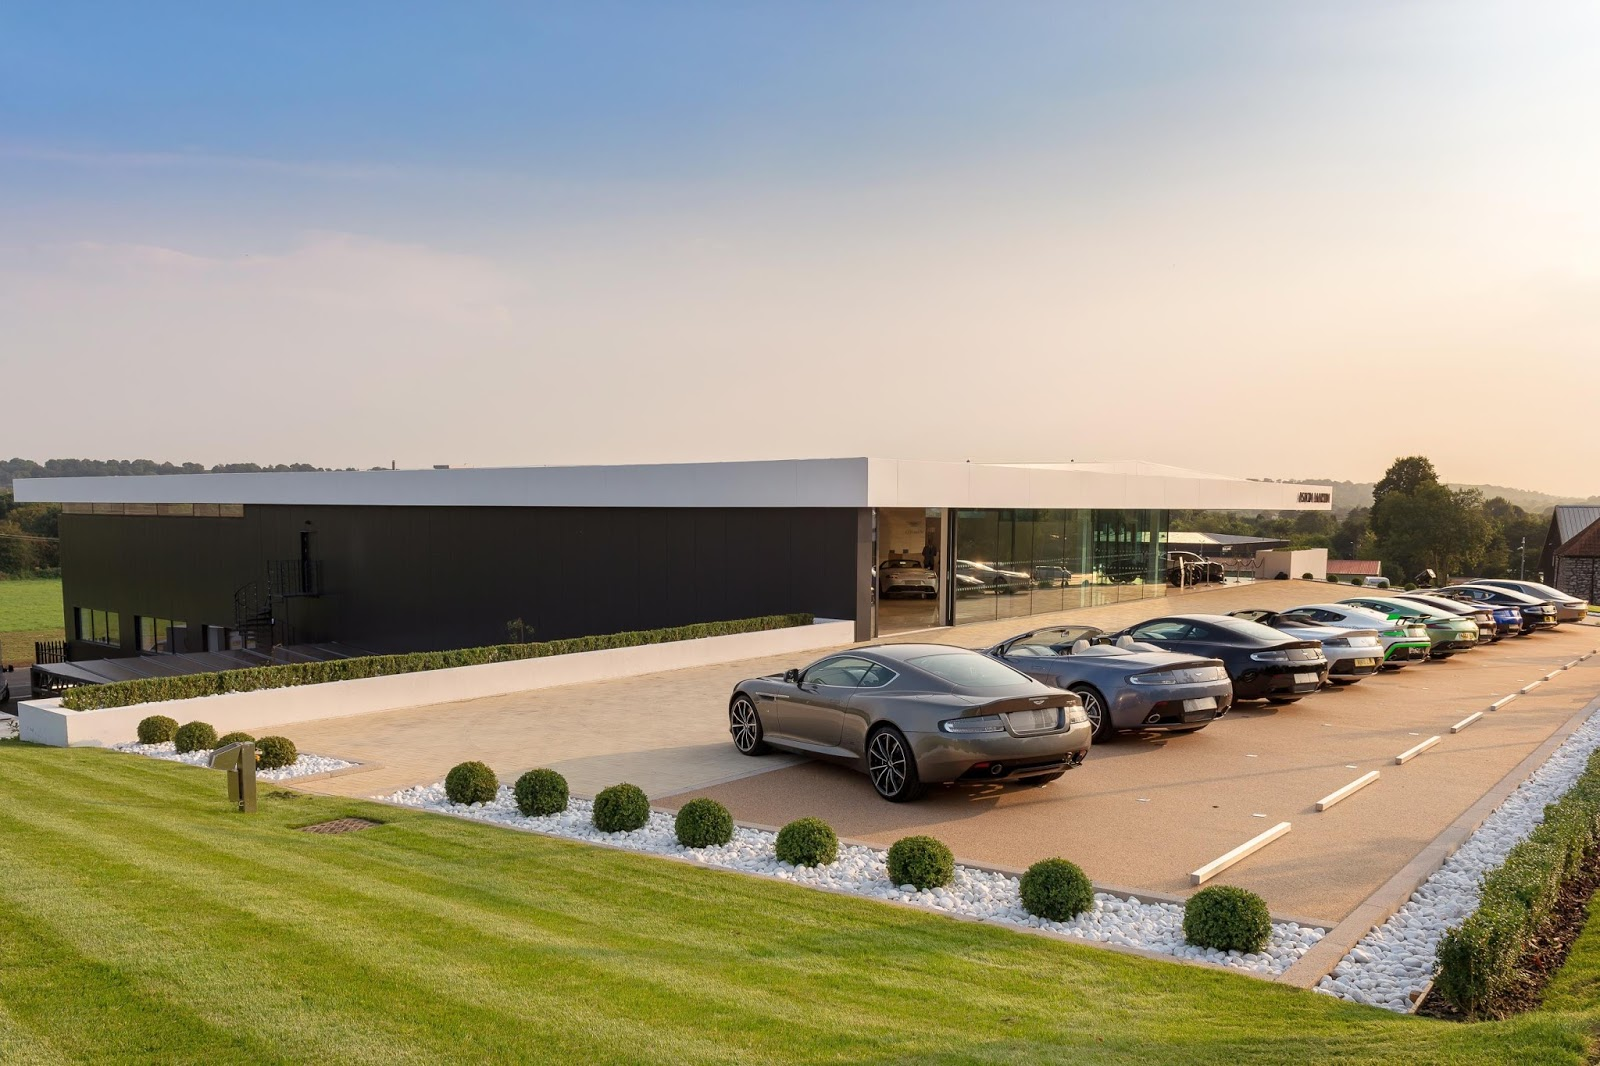 The Motoring World Latest Aston Martin Dealership Opens Up In - Aston martin dealers